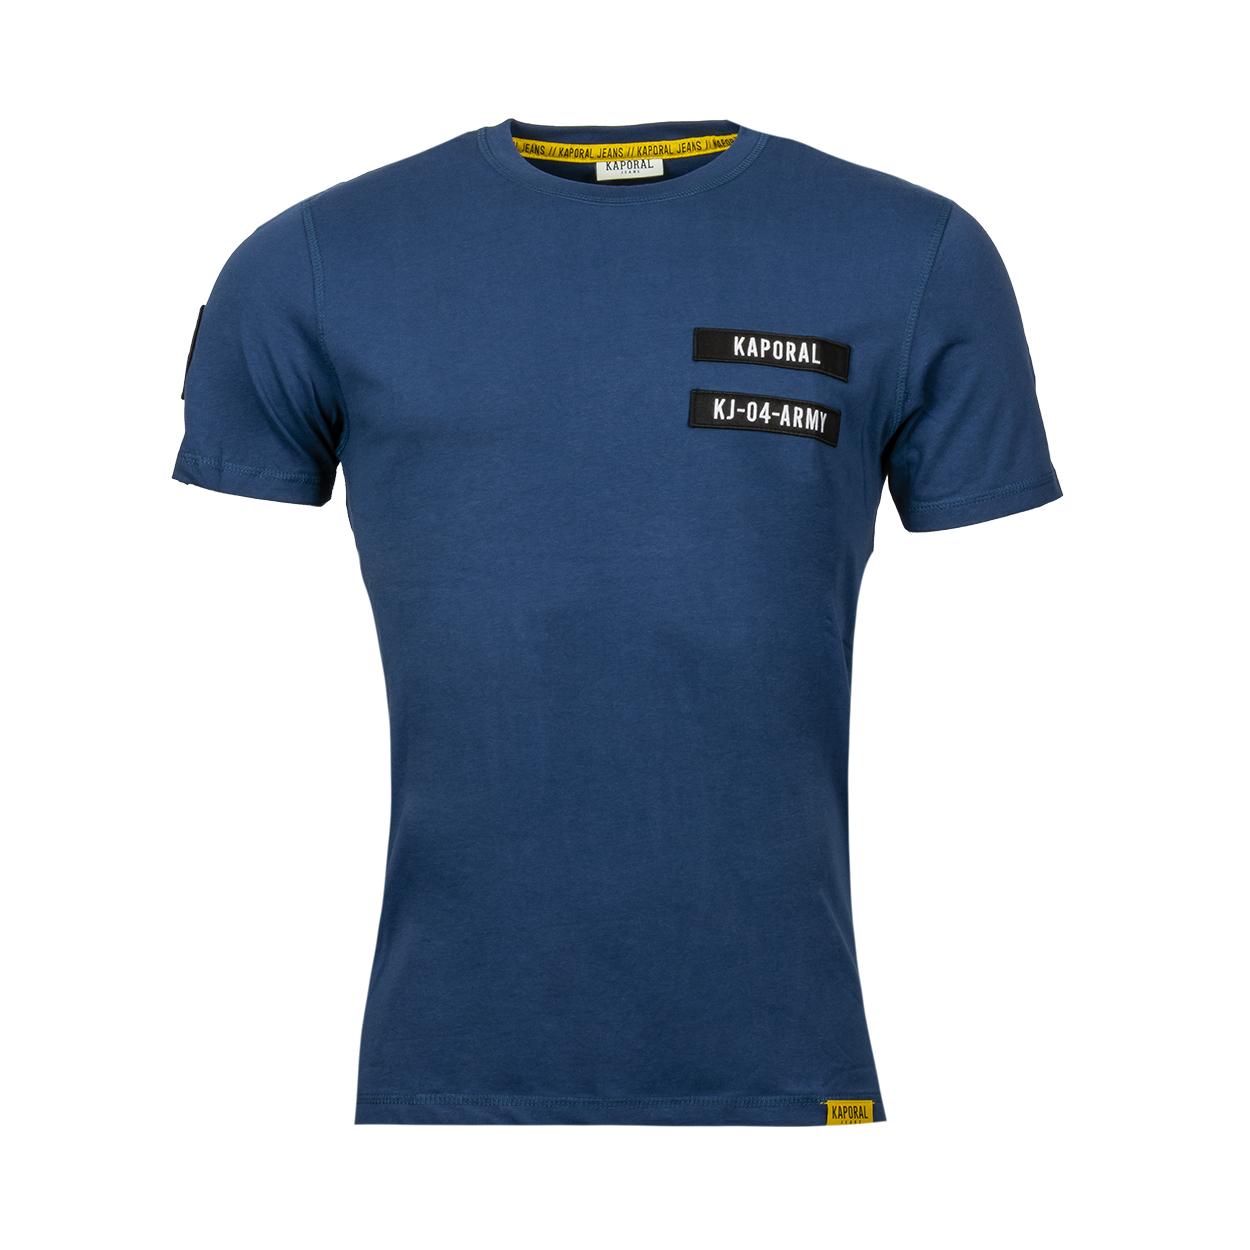 Tee-shirt col rond  tarmy en coton bleu marine